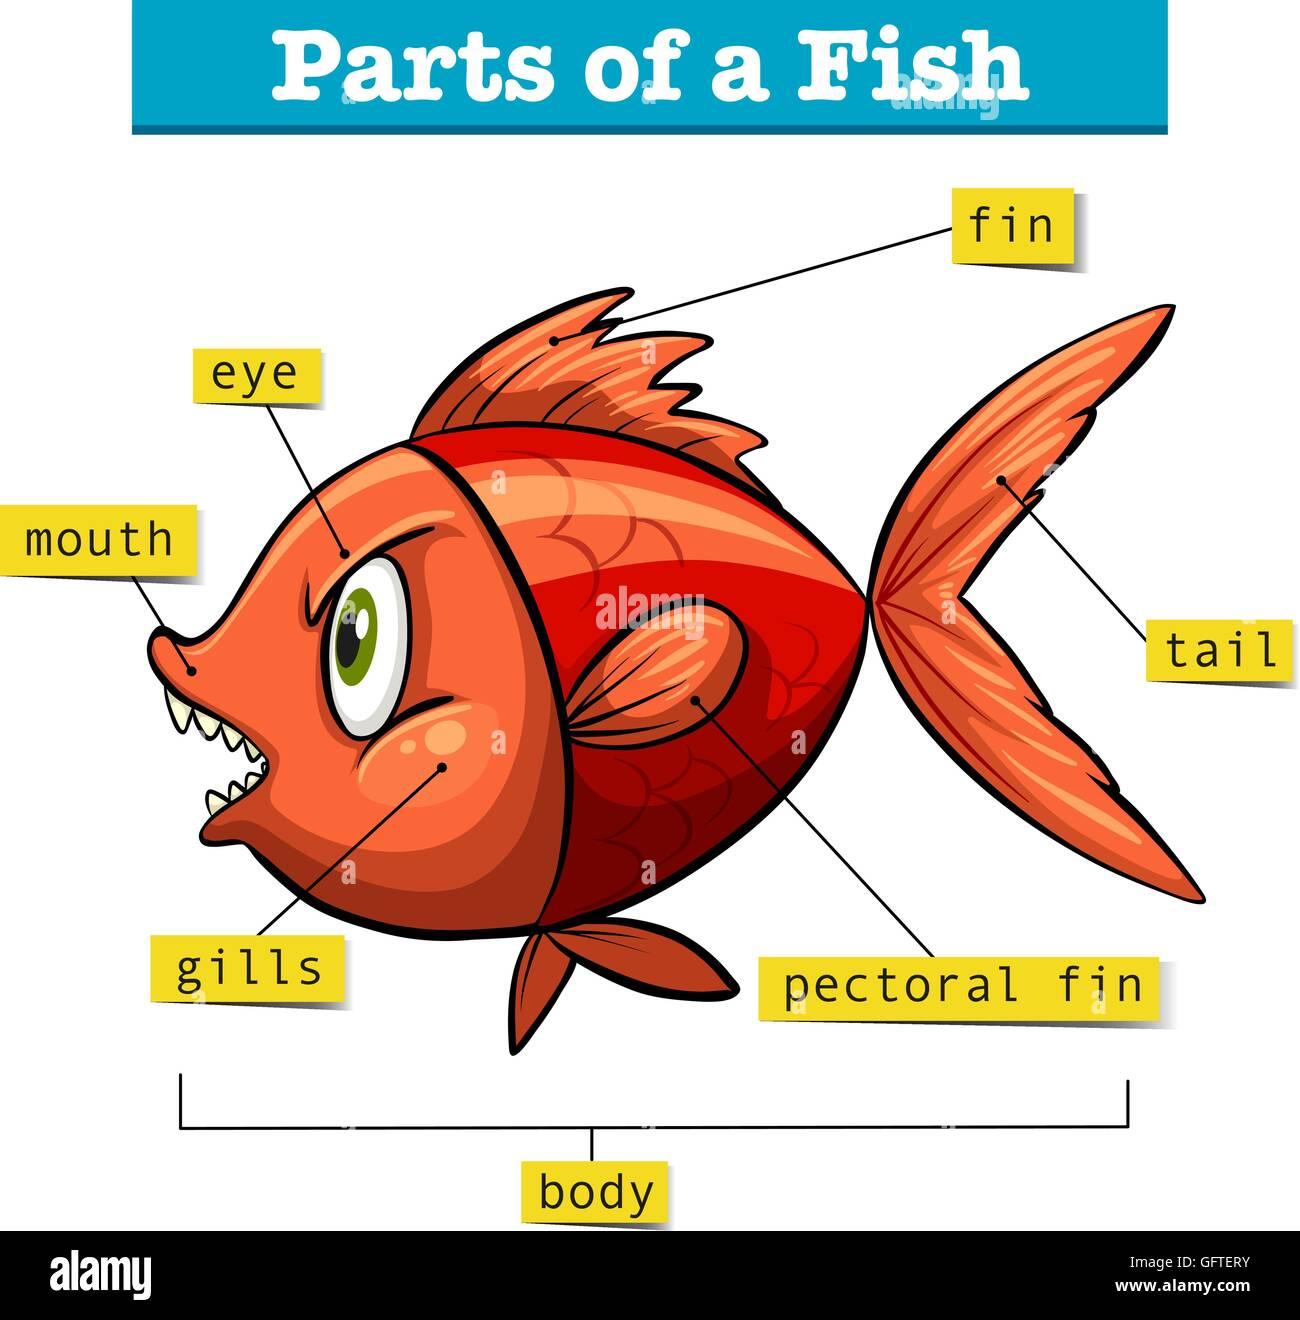 Diagram Showing Parts Of Fish Illustration Stock Vector Art Amp Illustration Vector Image